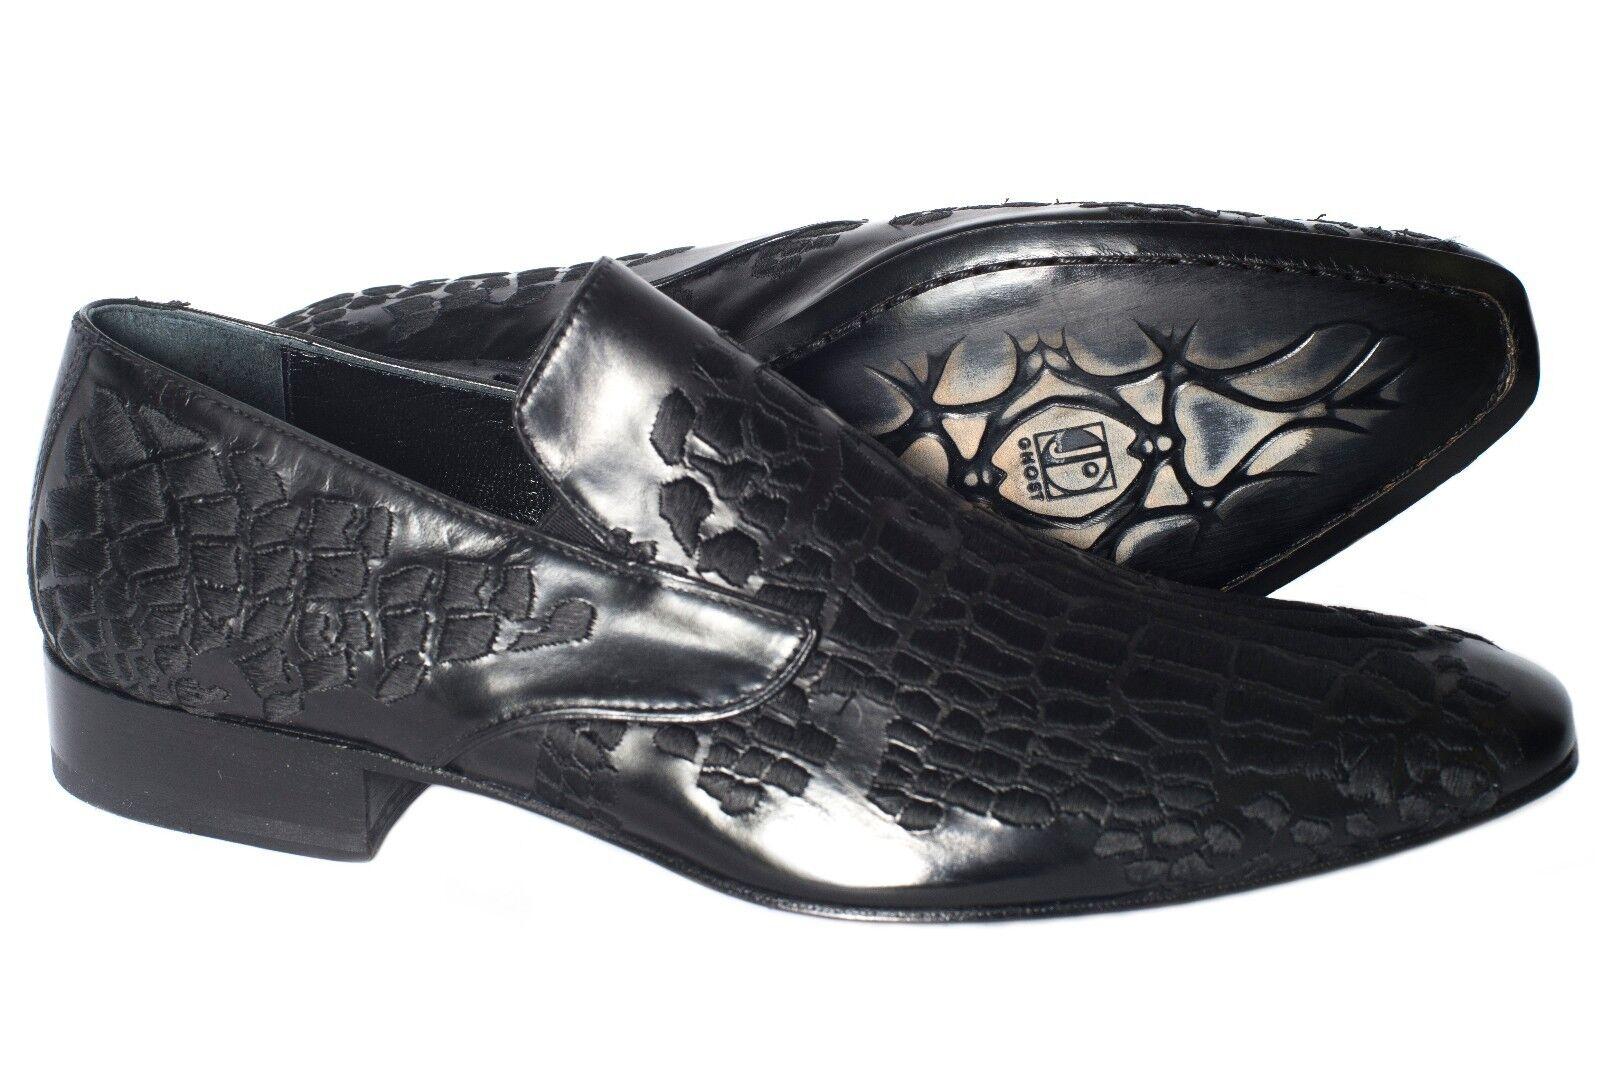 Jo GHost 3484Bis Italian Mens nero slip on scarpe with embroidery